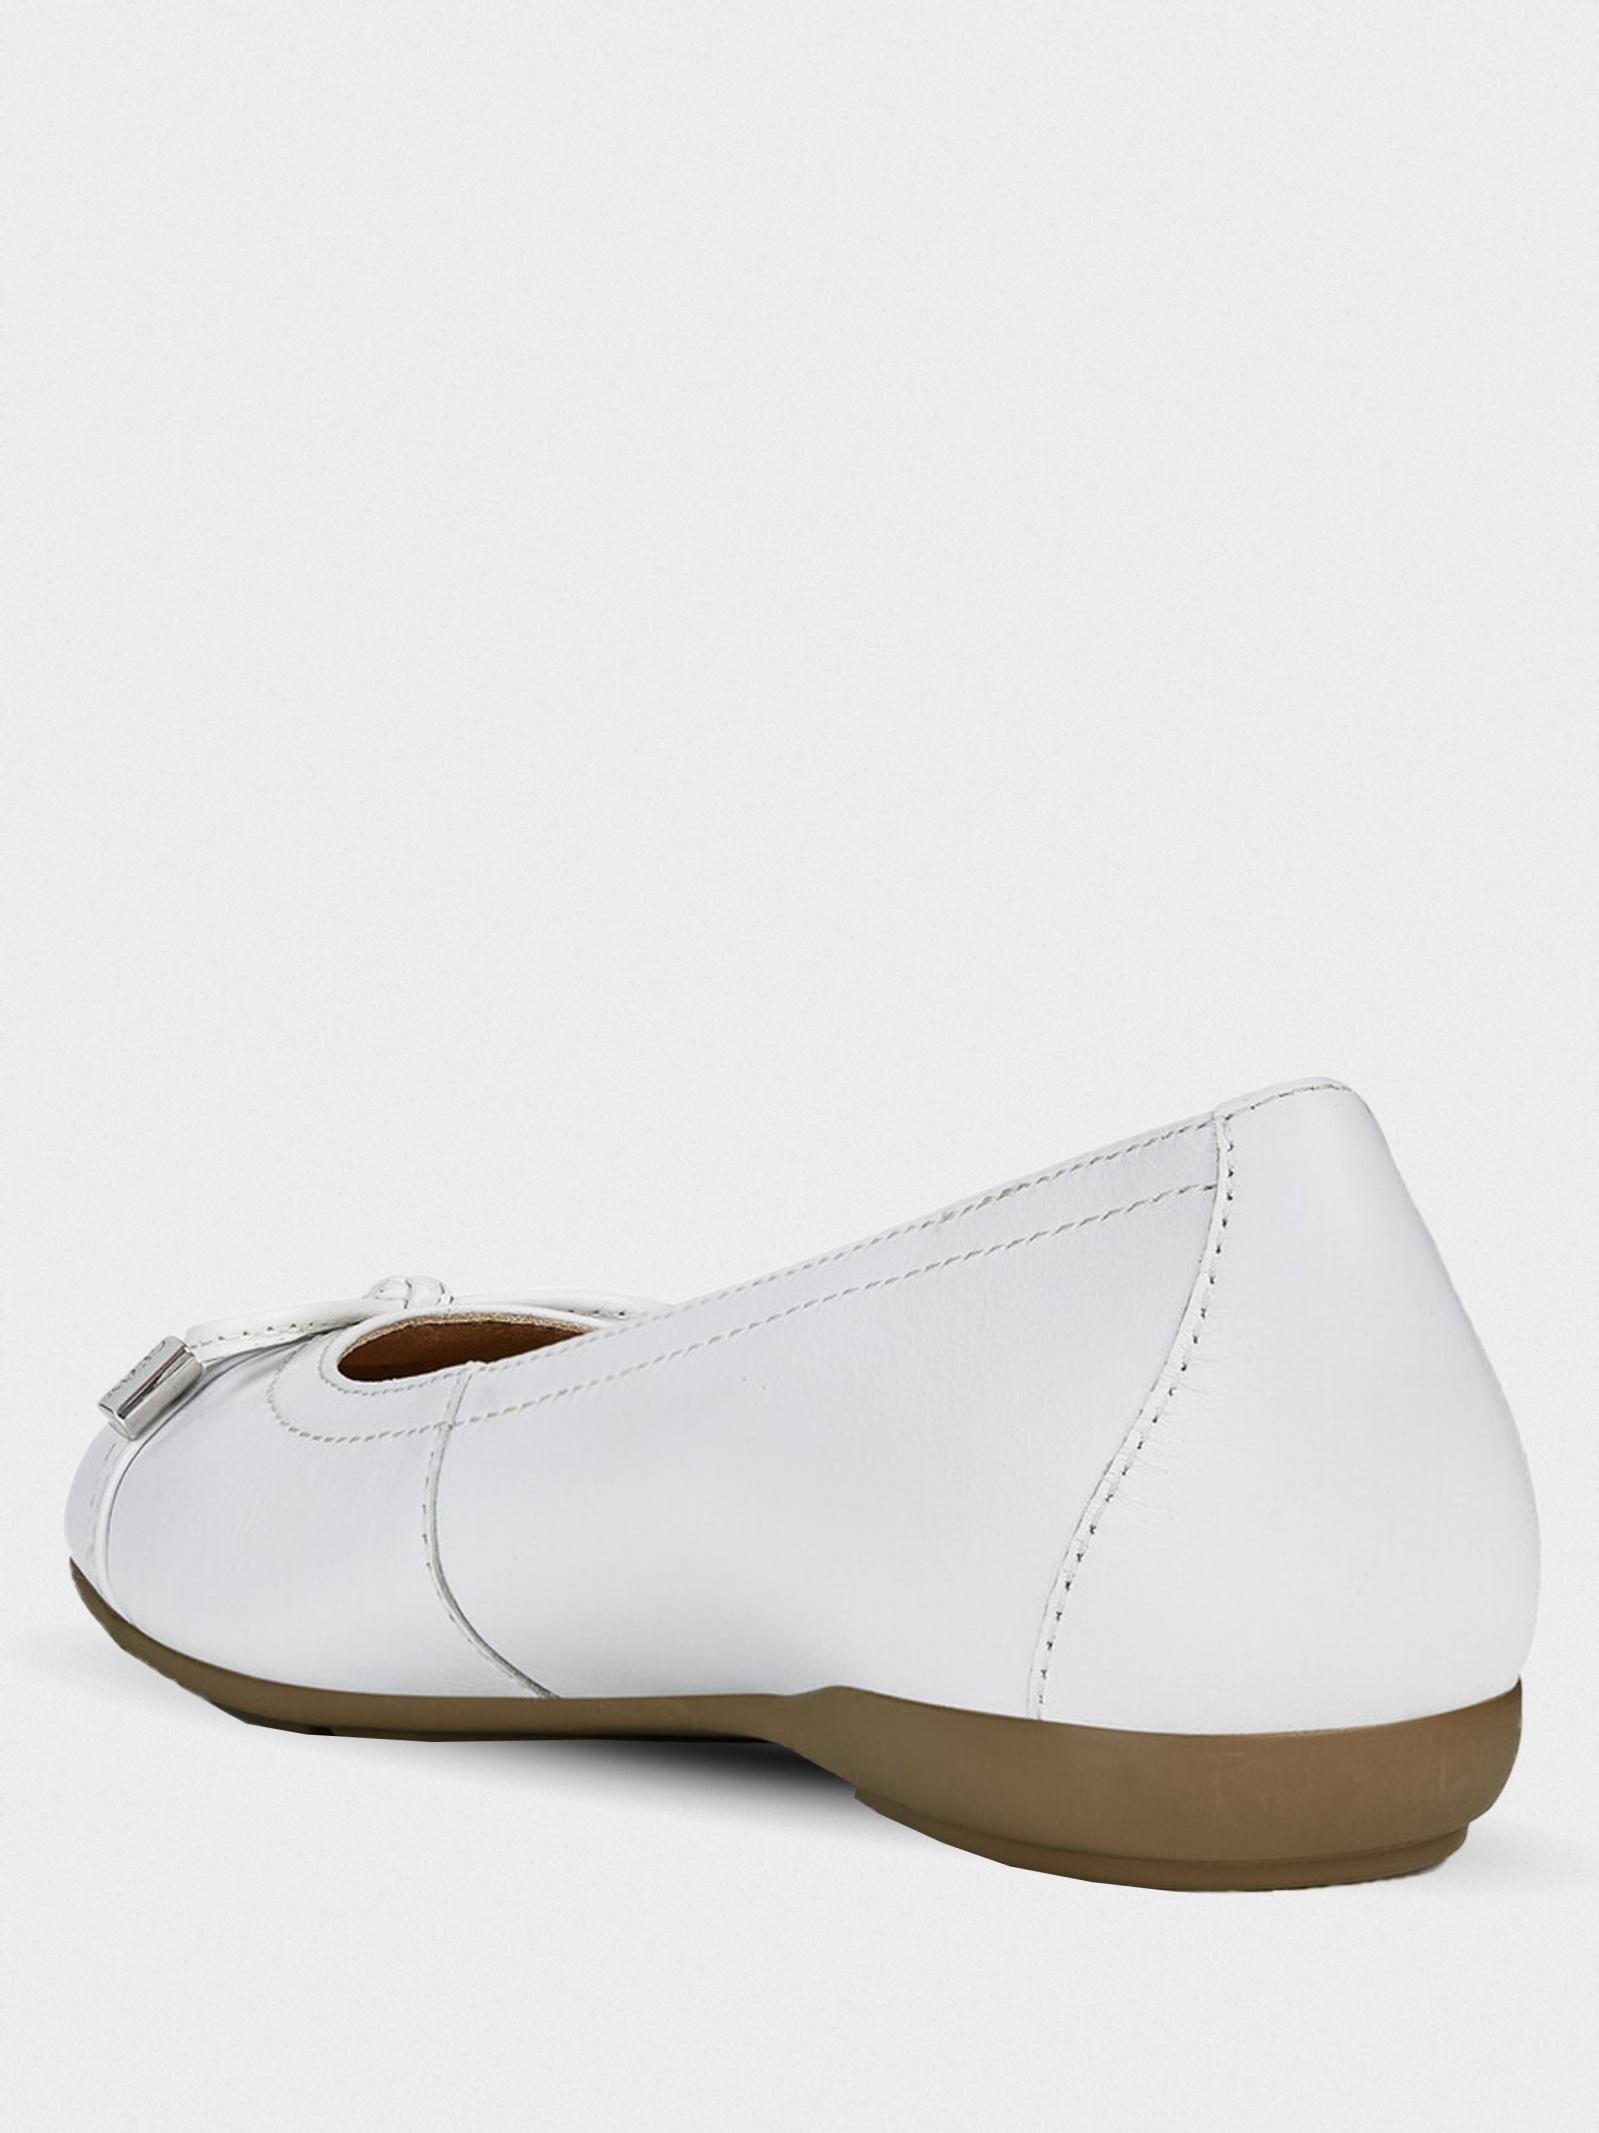 Балетки для женщин Geox D ANNYTAH XW3986 брендовая обувь, 2017